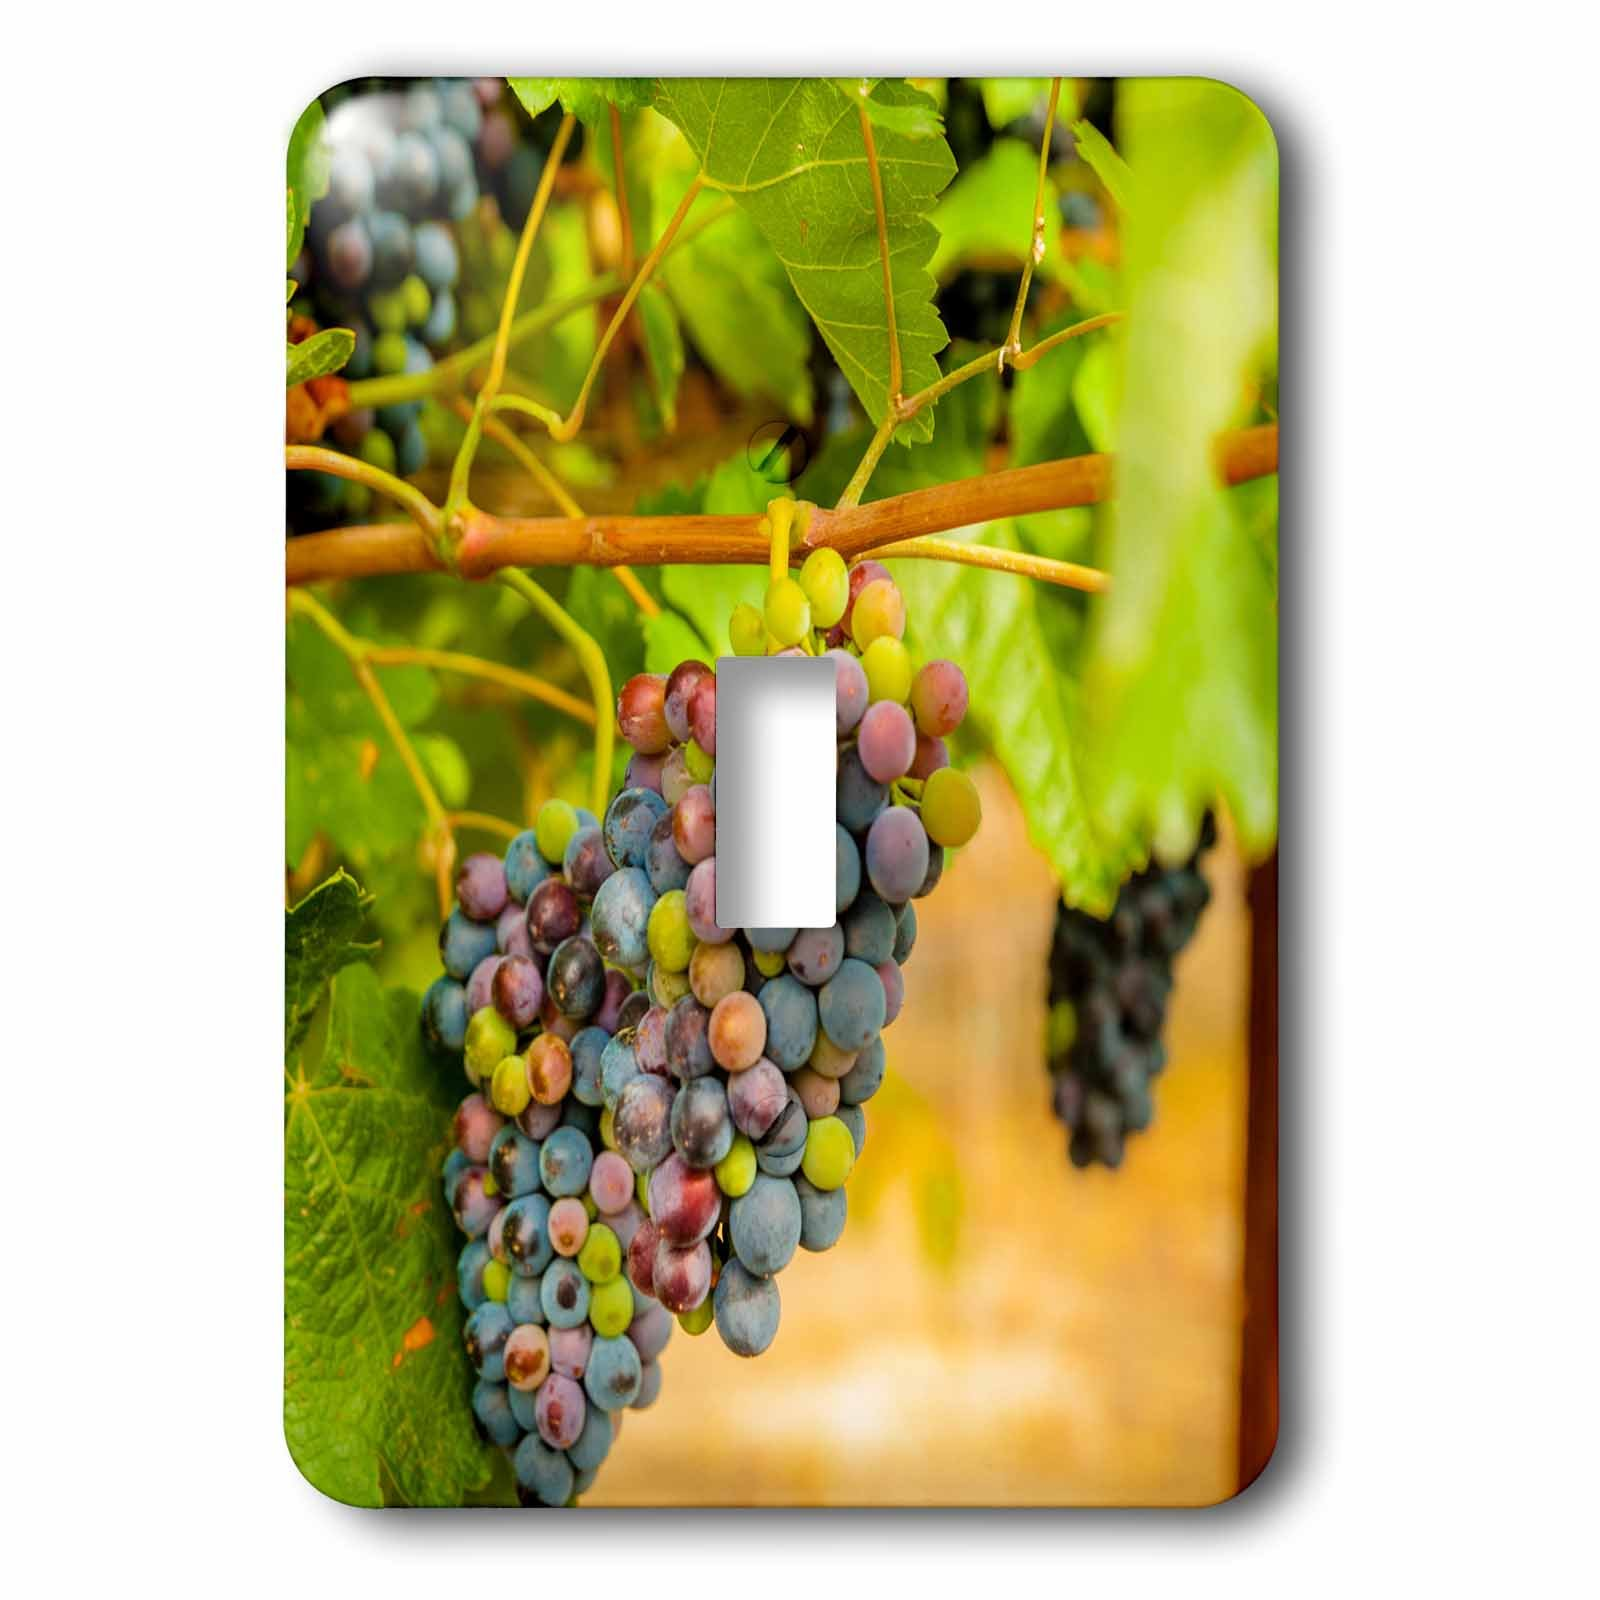 3dRose Danita Delimont - Vineyards - Usa, Washington State, Yakima Valley. Syrah grapes. - Light Switch Covers - single toggle switch (lsp_260521_1)